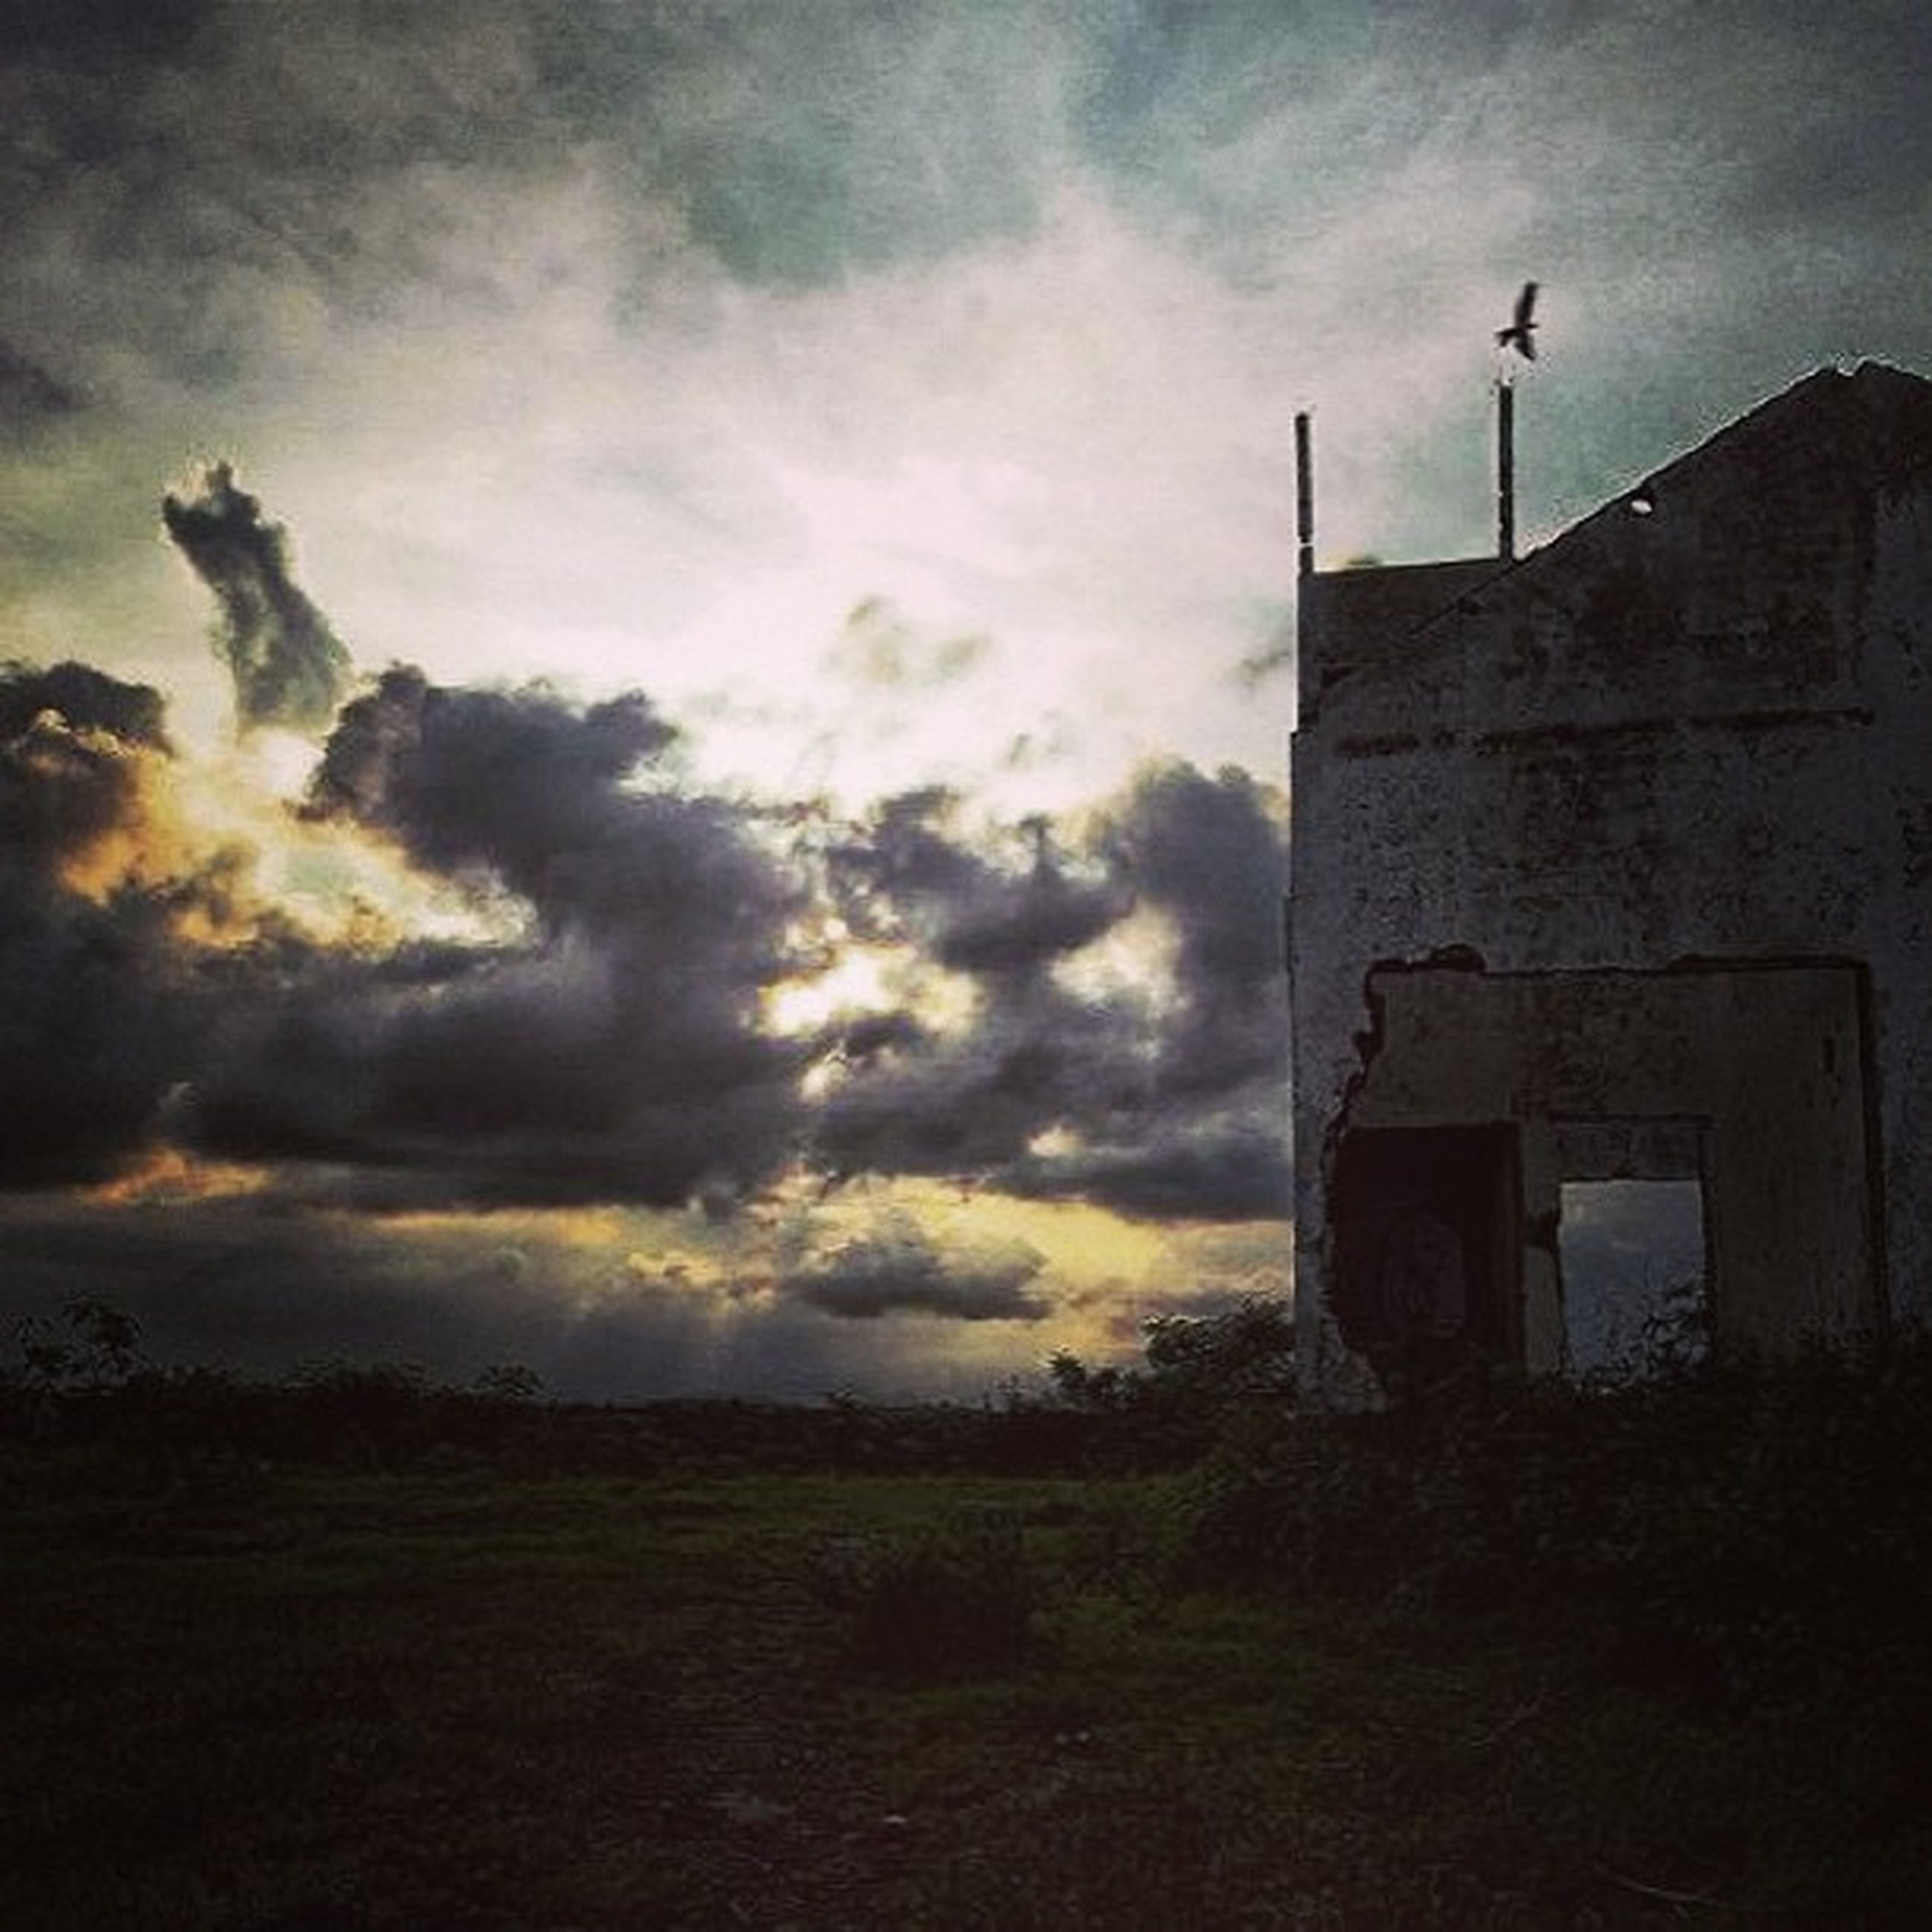 sky, cloud - sky, architecture, building exterior, built structure, cloudy, sunset, cloud, field, low angle view, silhouette, weather, house, nature, outdoors, landscape, no people, overcast, dusk, building